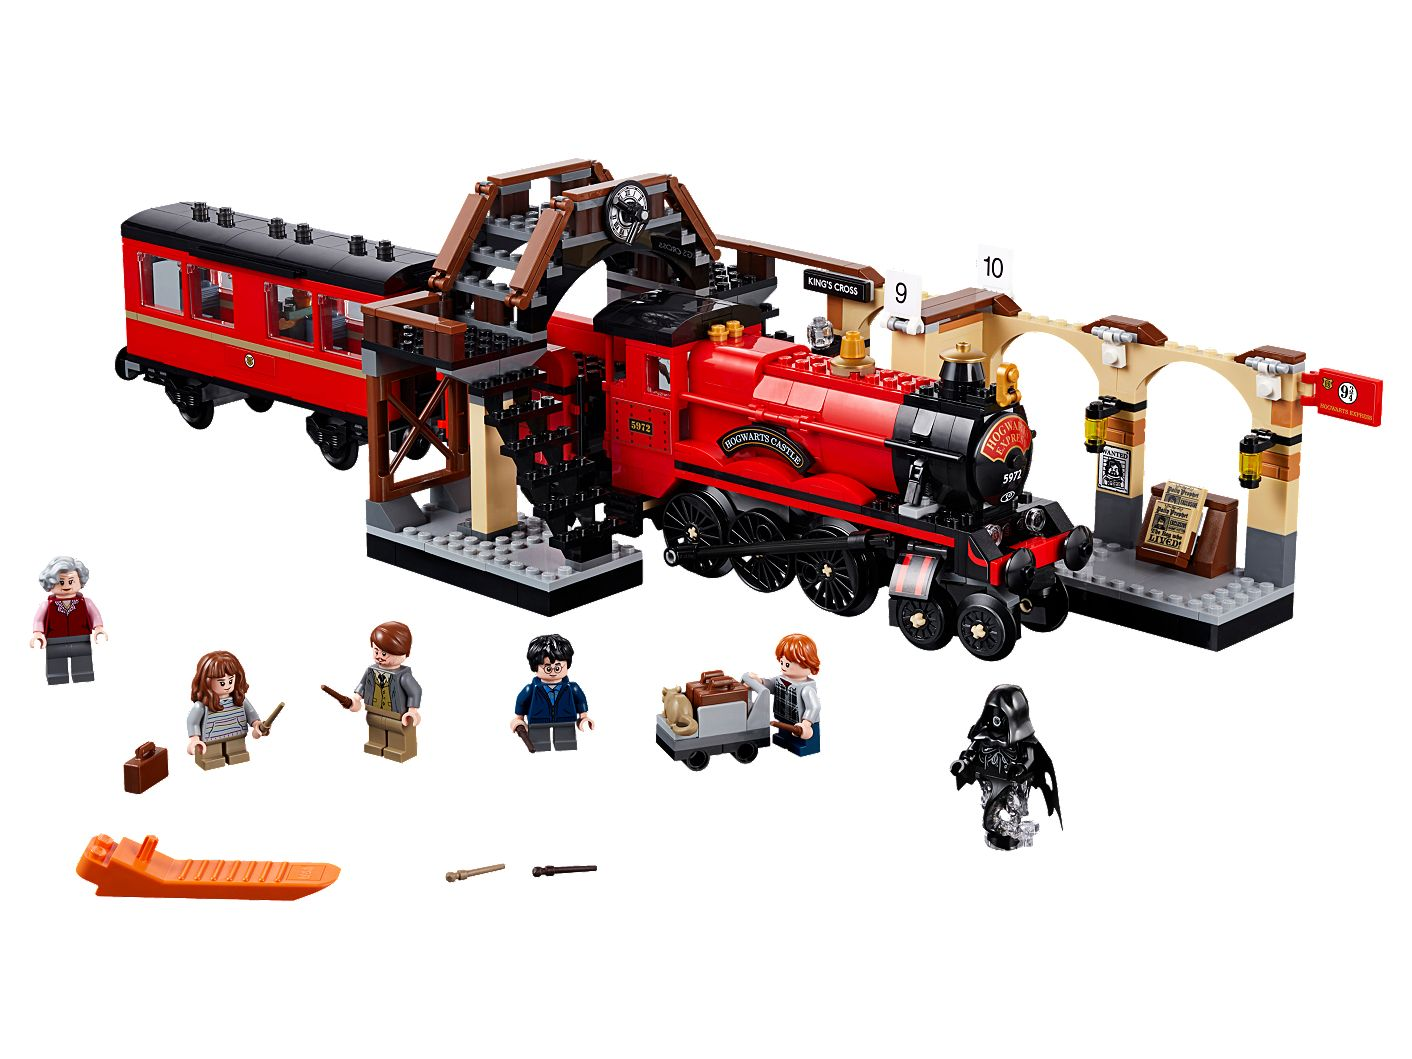 LEGO Harry Potter Hogwarts Express Platform only from 75955 FREE Signed Delivery